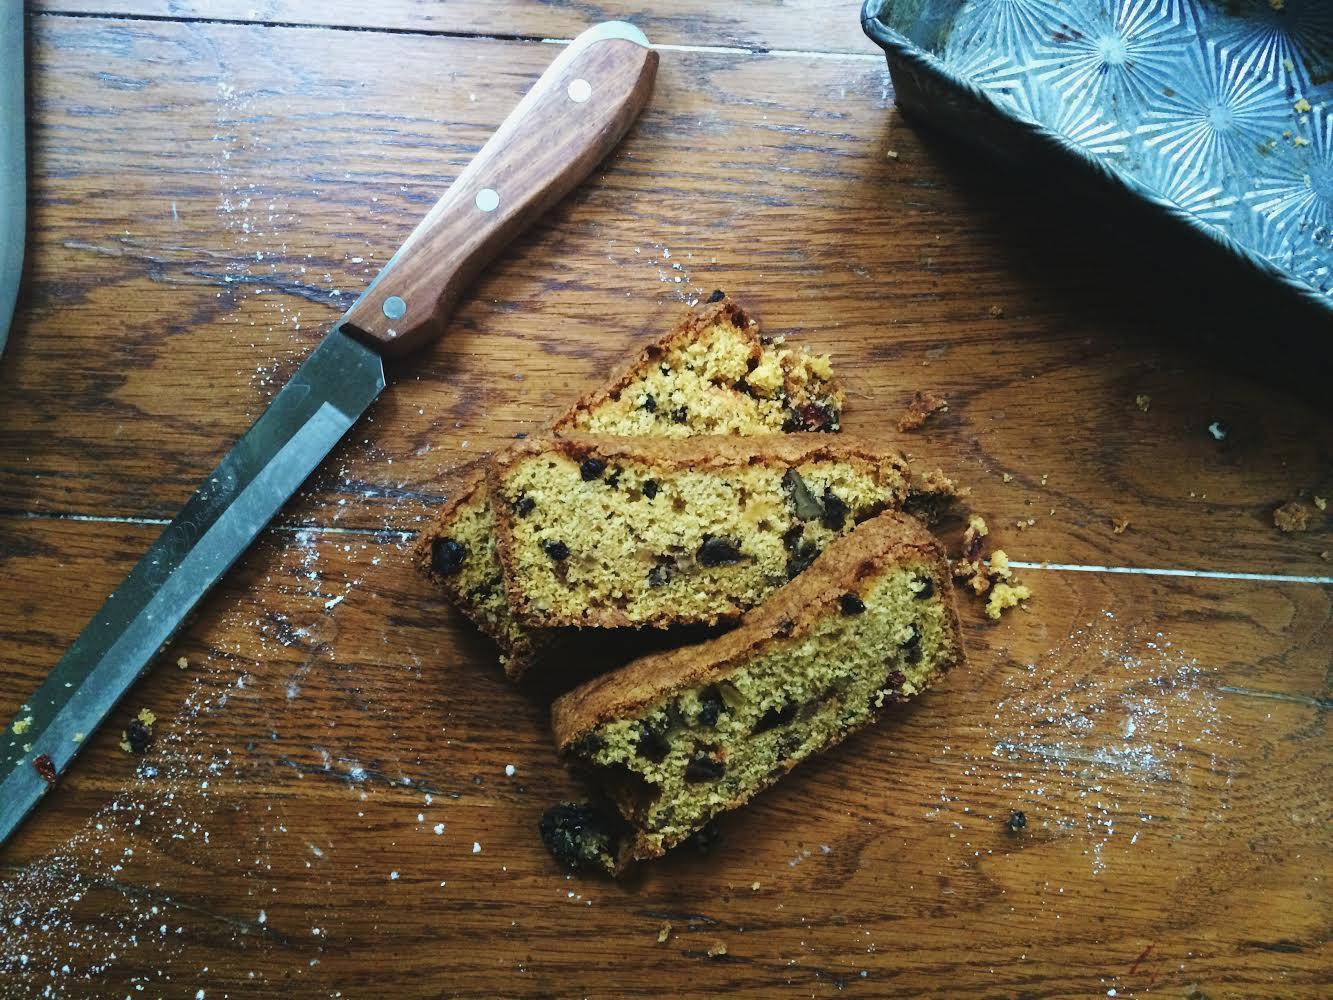 Homespun-ATL-Harvest-Sweet-Potato-Loaf-Recipe-Photos-by-Haley-Sheffield_0034.jpg